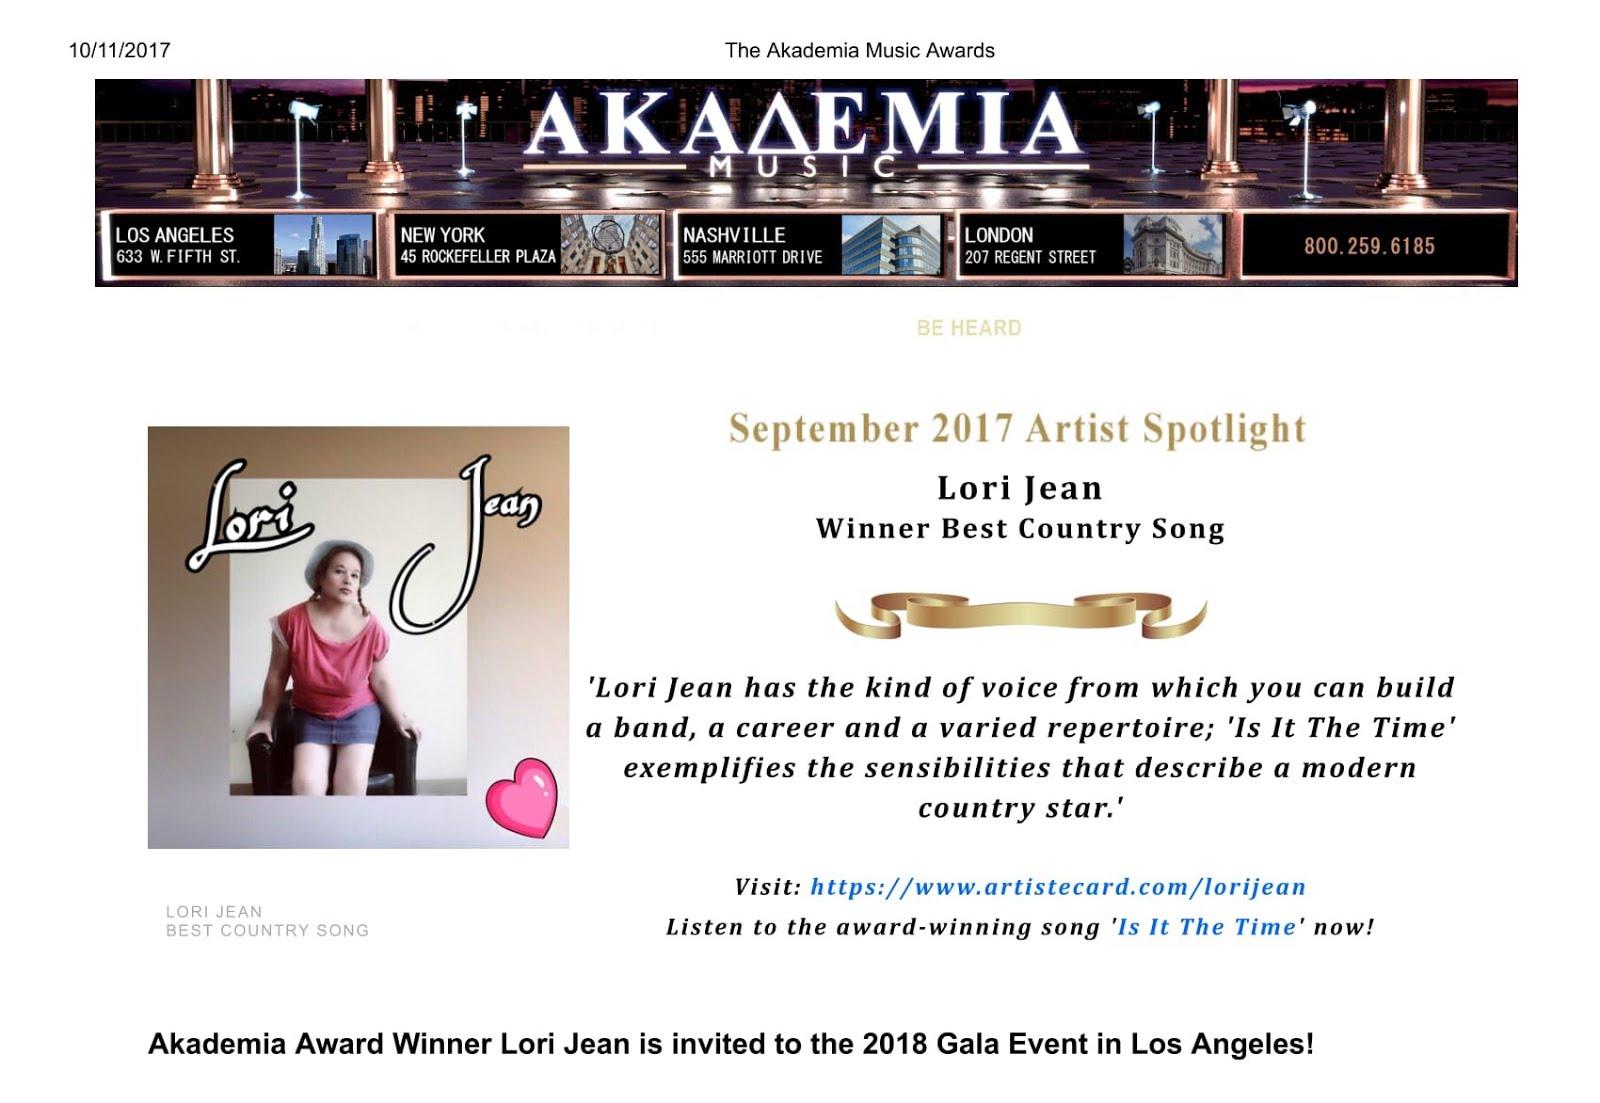 Akademia Music Award